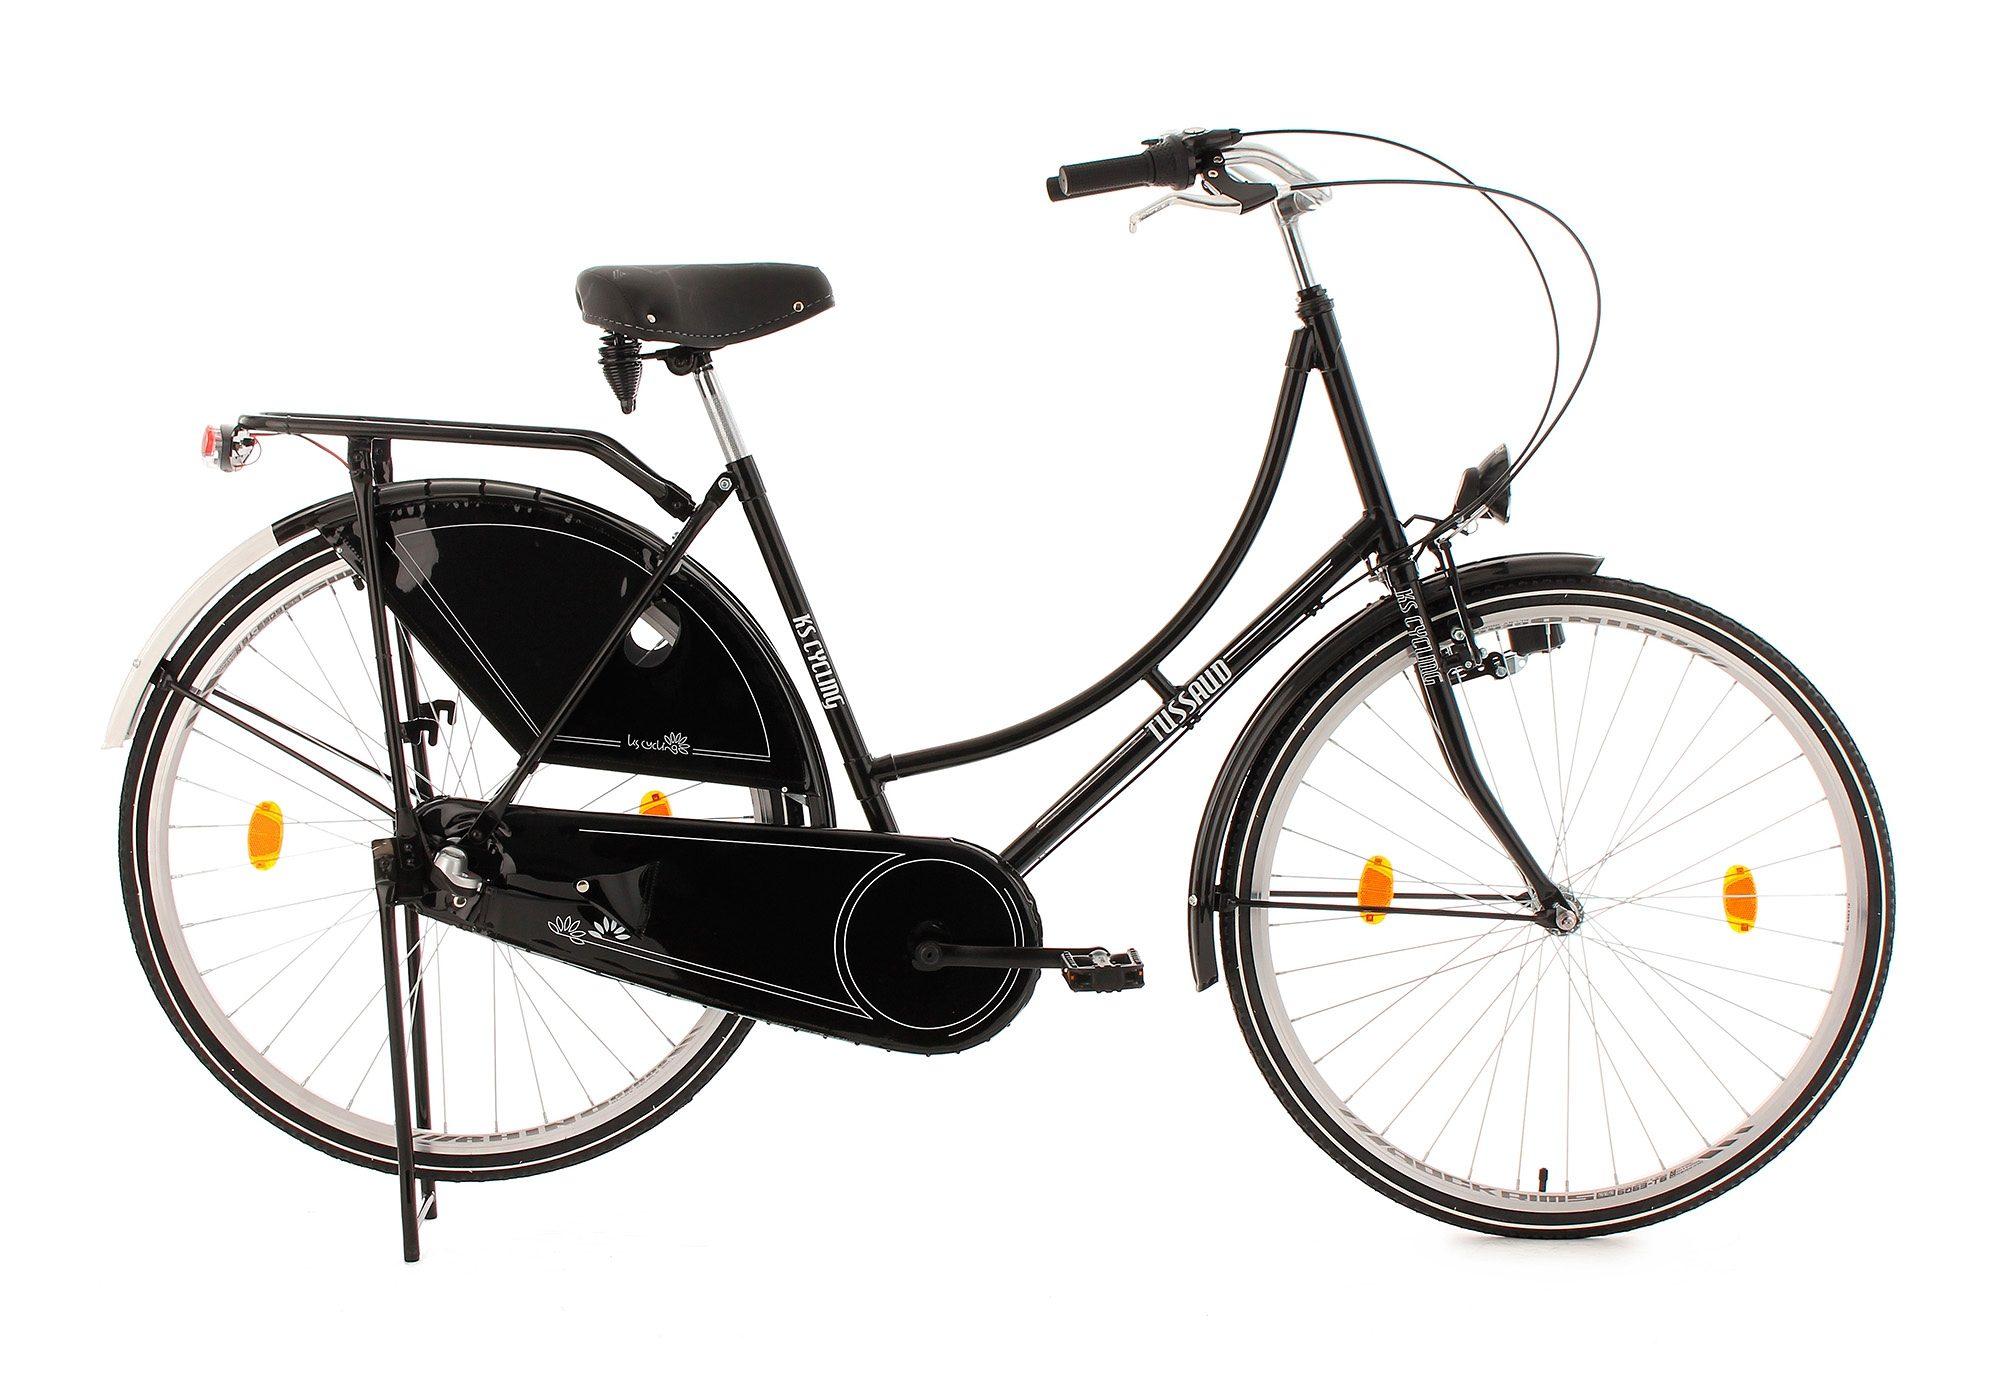 Hollandrad, 28 Zoll, 3 Gang Nabenschaltung, schwarz, »Tussaud«, KS Cycling